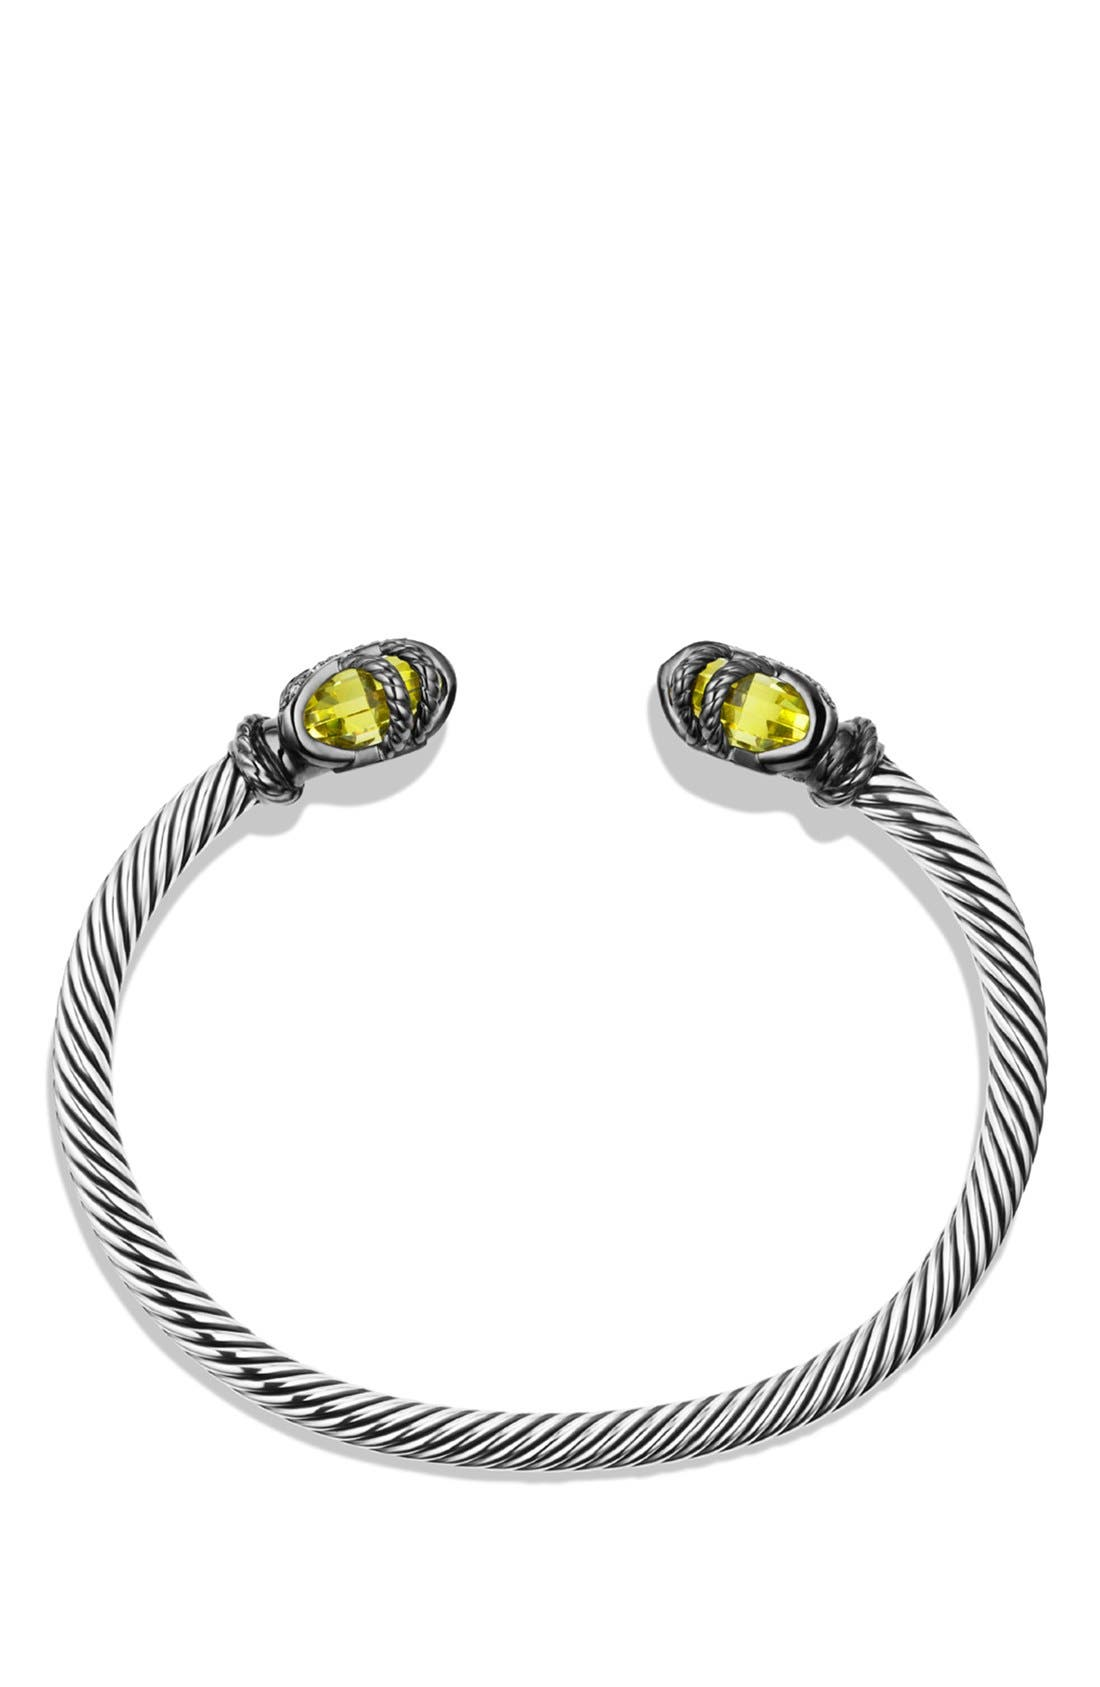 Alternate Image 2  - David Yurman 'Cable Wrap' Bracelet with Lemon Citrine and Diamonds